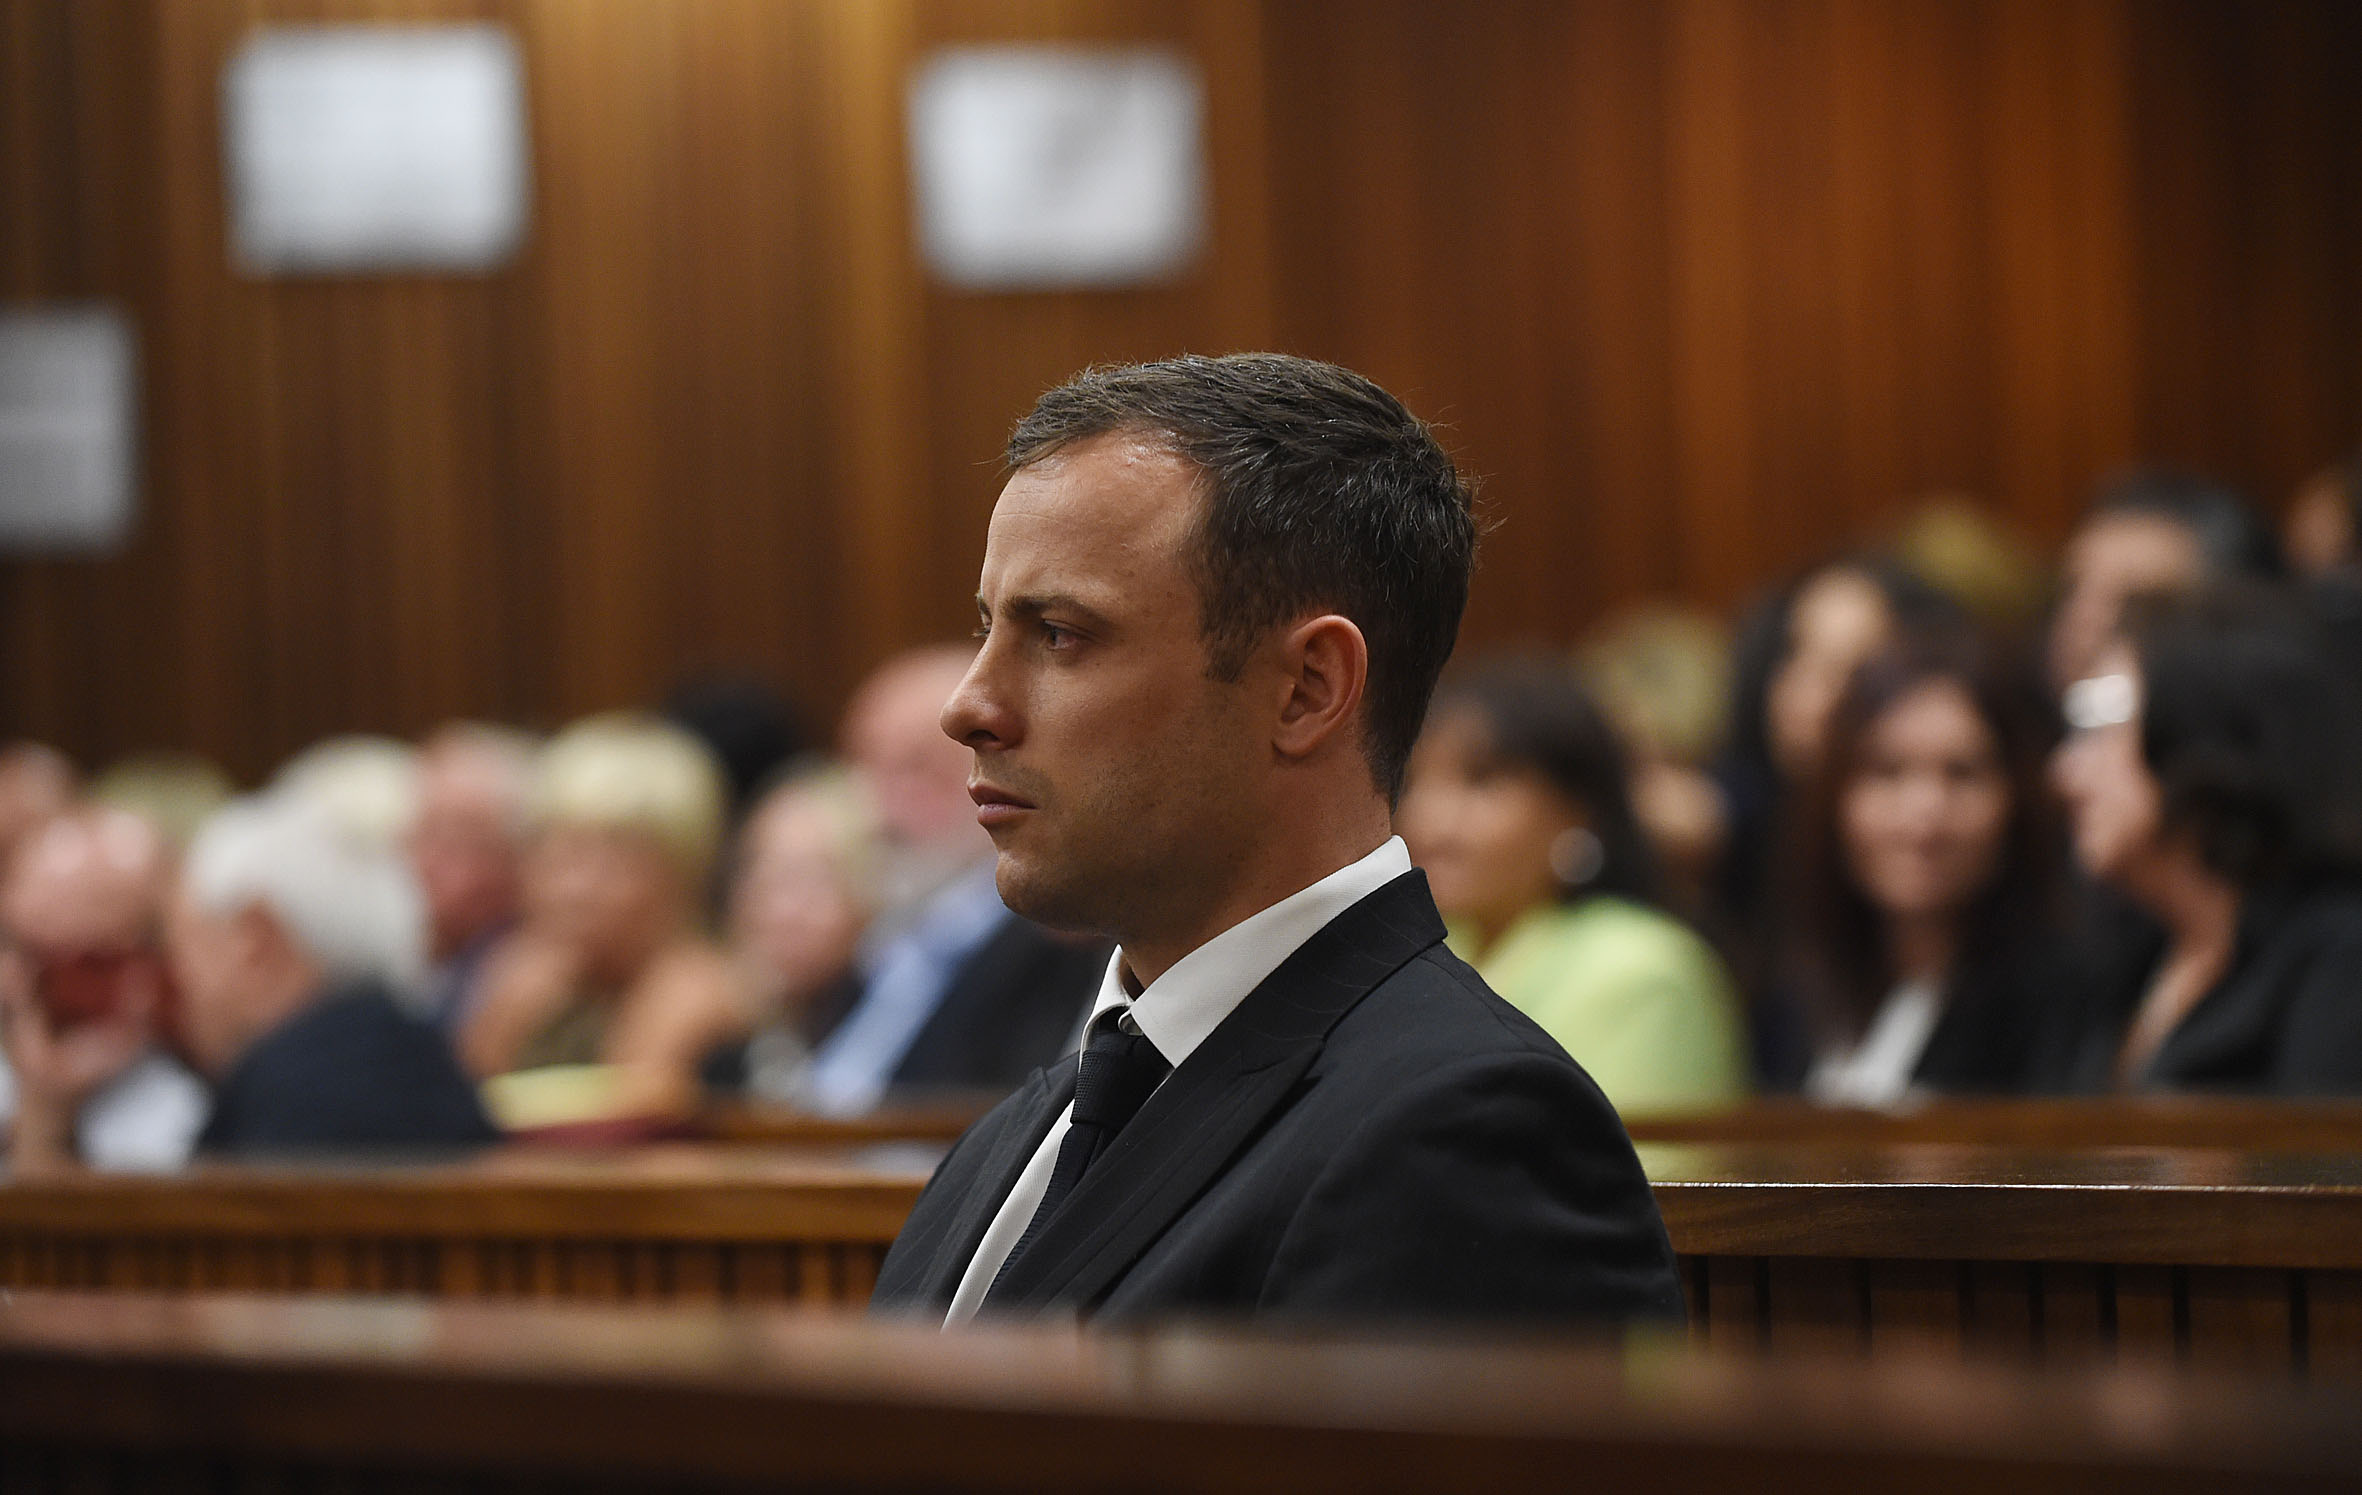 Oscar Pistorius sits in the Pretoria High Court on September 11, 2014, in Pretoria, South Africa.